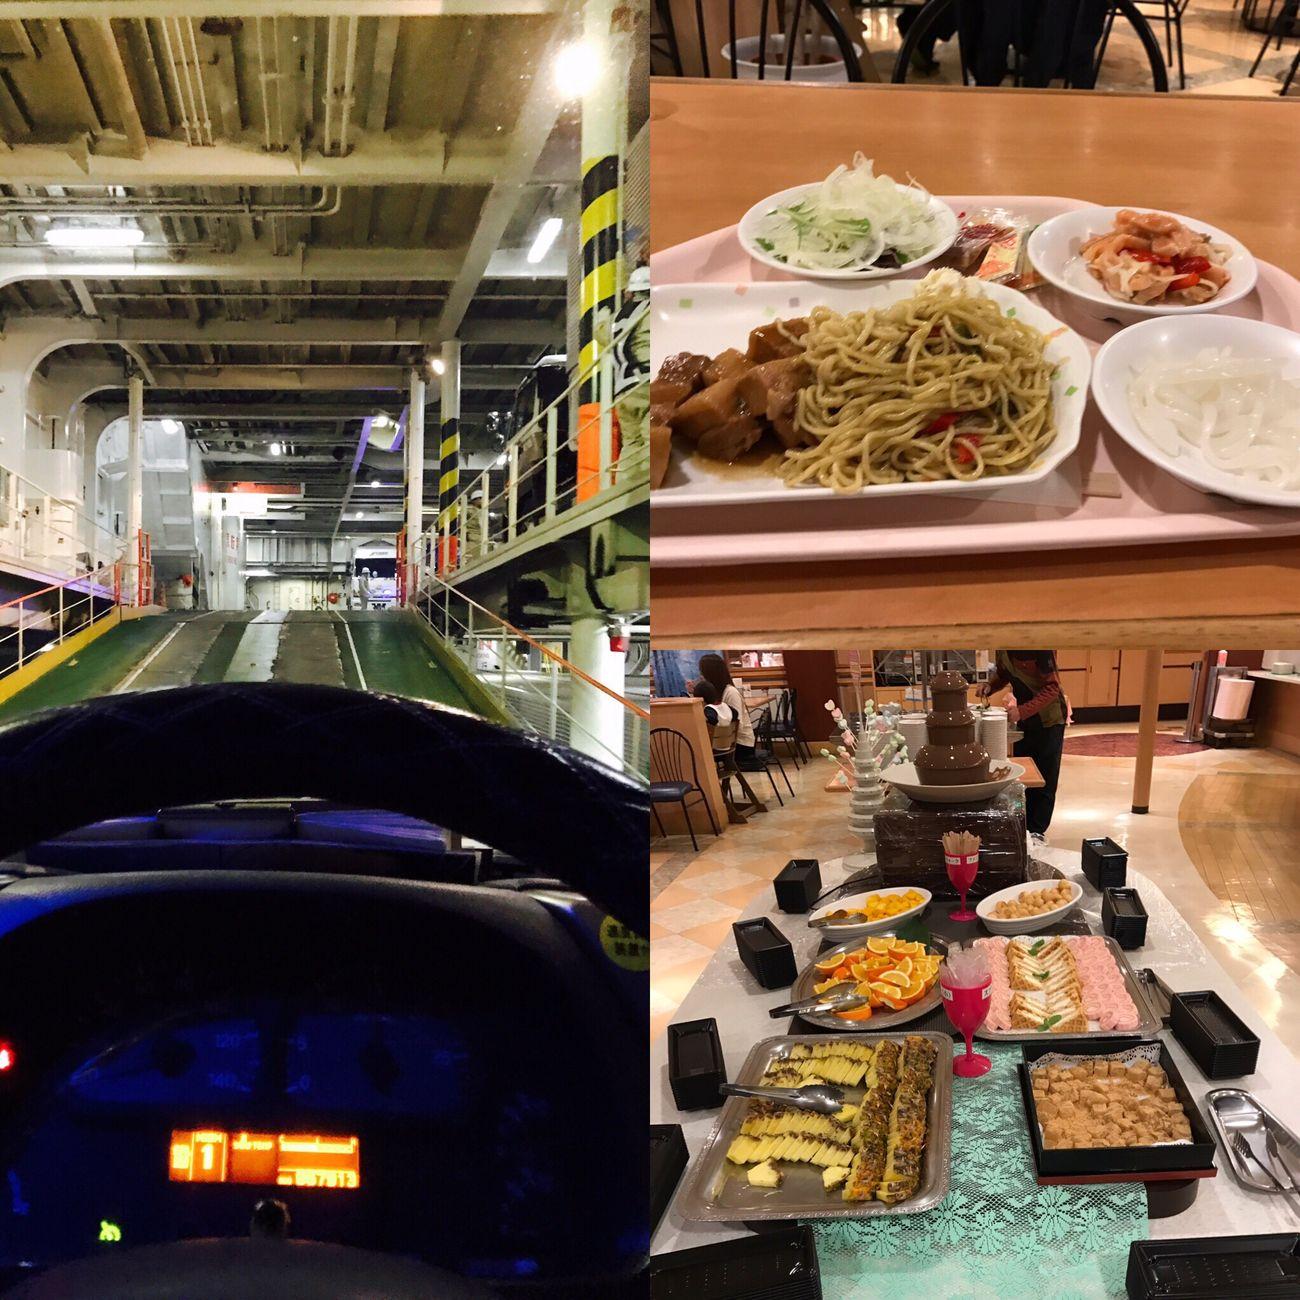 Enjoying Life Self Portrait Yummy Transportation Trucks Truck EyeEm Japan Japan EyeEm Japan Photography EyeEm Best Edits EyeEmBestPics EyeEm Gallery EyeEm Best Shots 今年の初フェリー!いっぱい食べて…飲んで…寝ます( ゚∀゚)o彡°